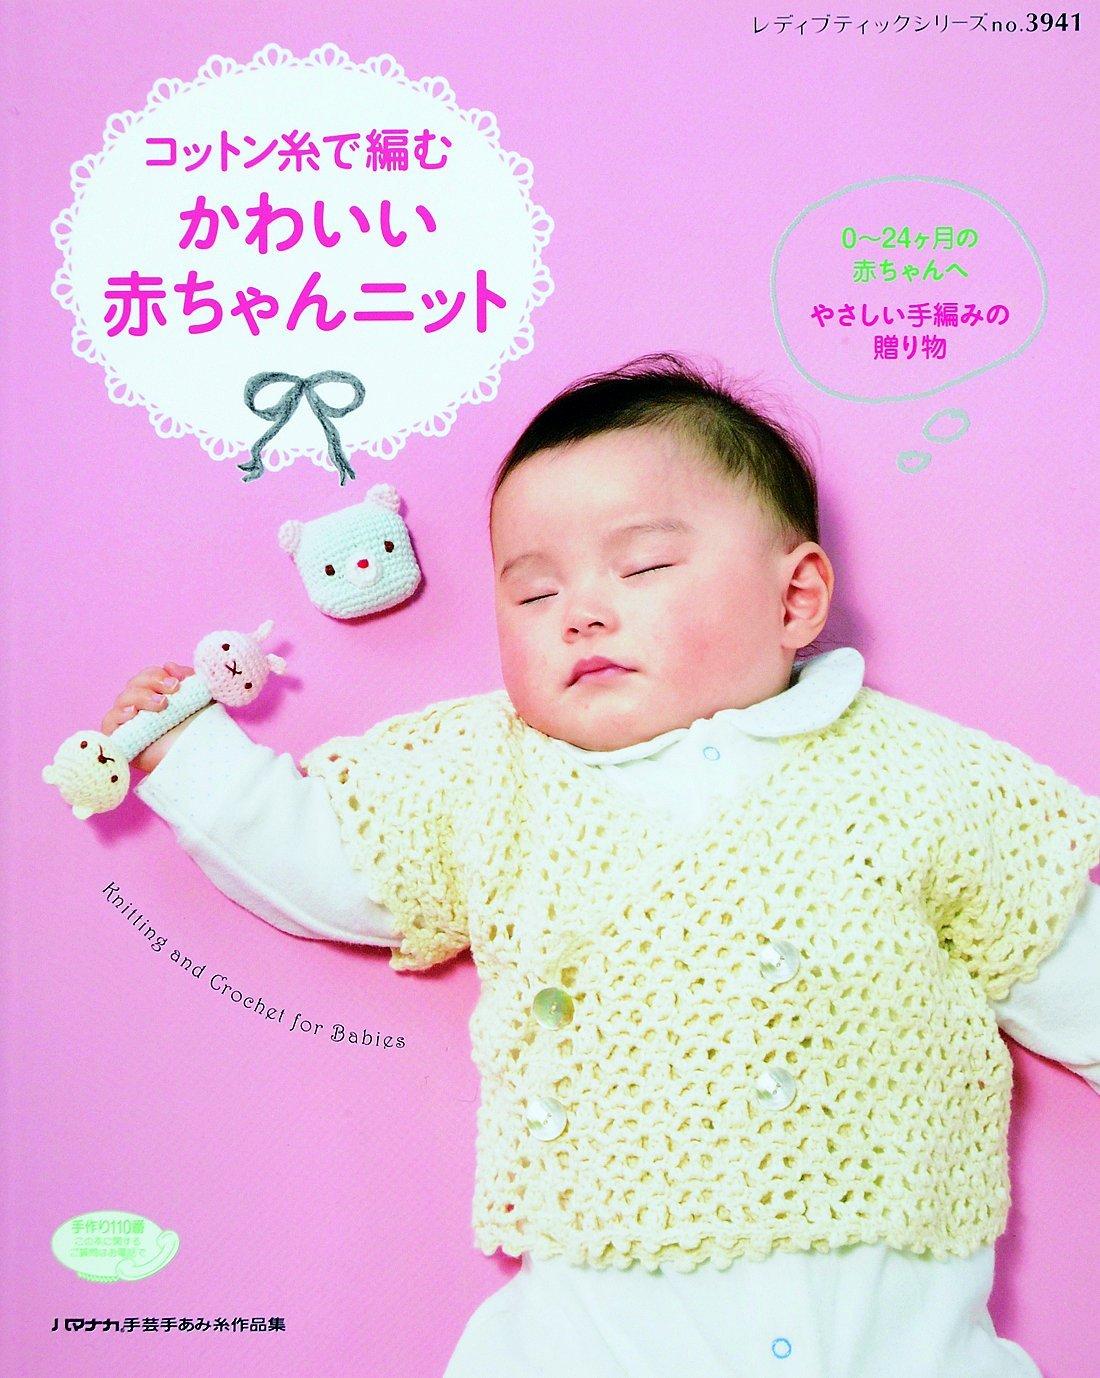 Cute baby knit knitting cotton yarn